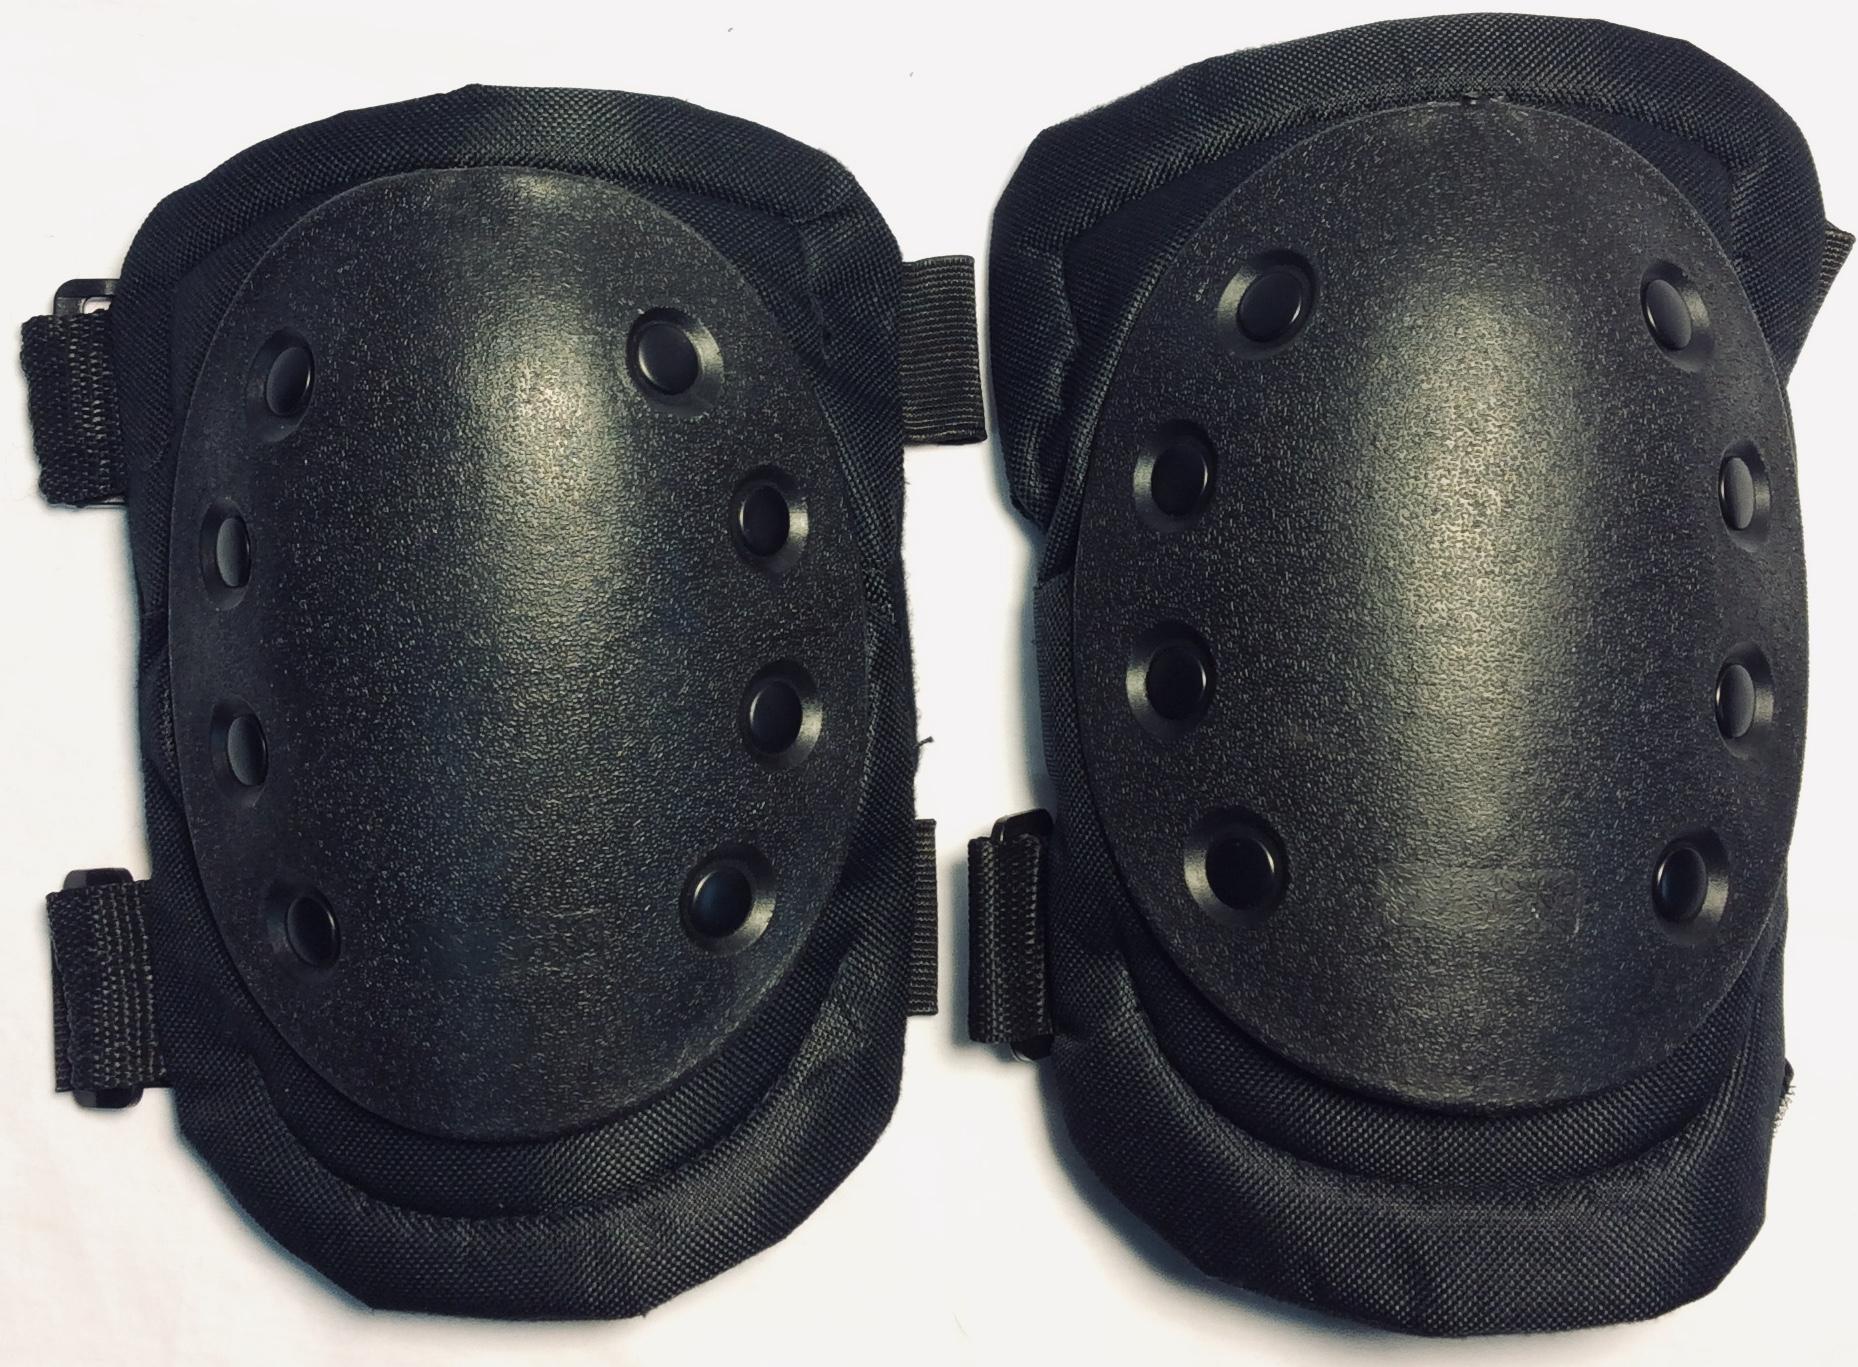 Black tactical kneepads